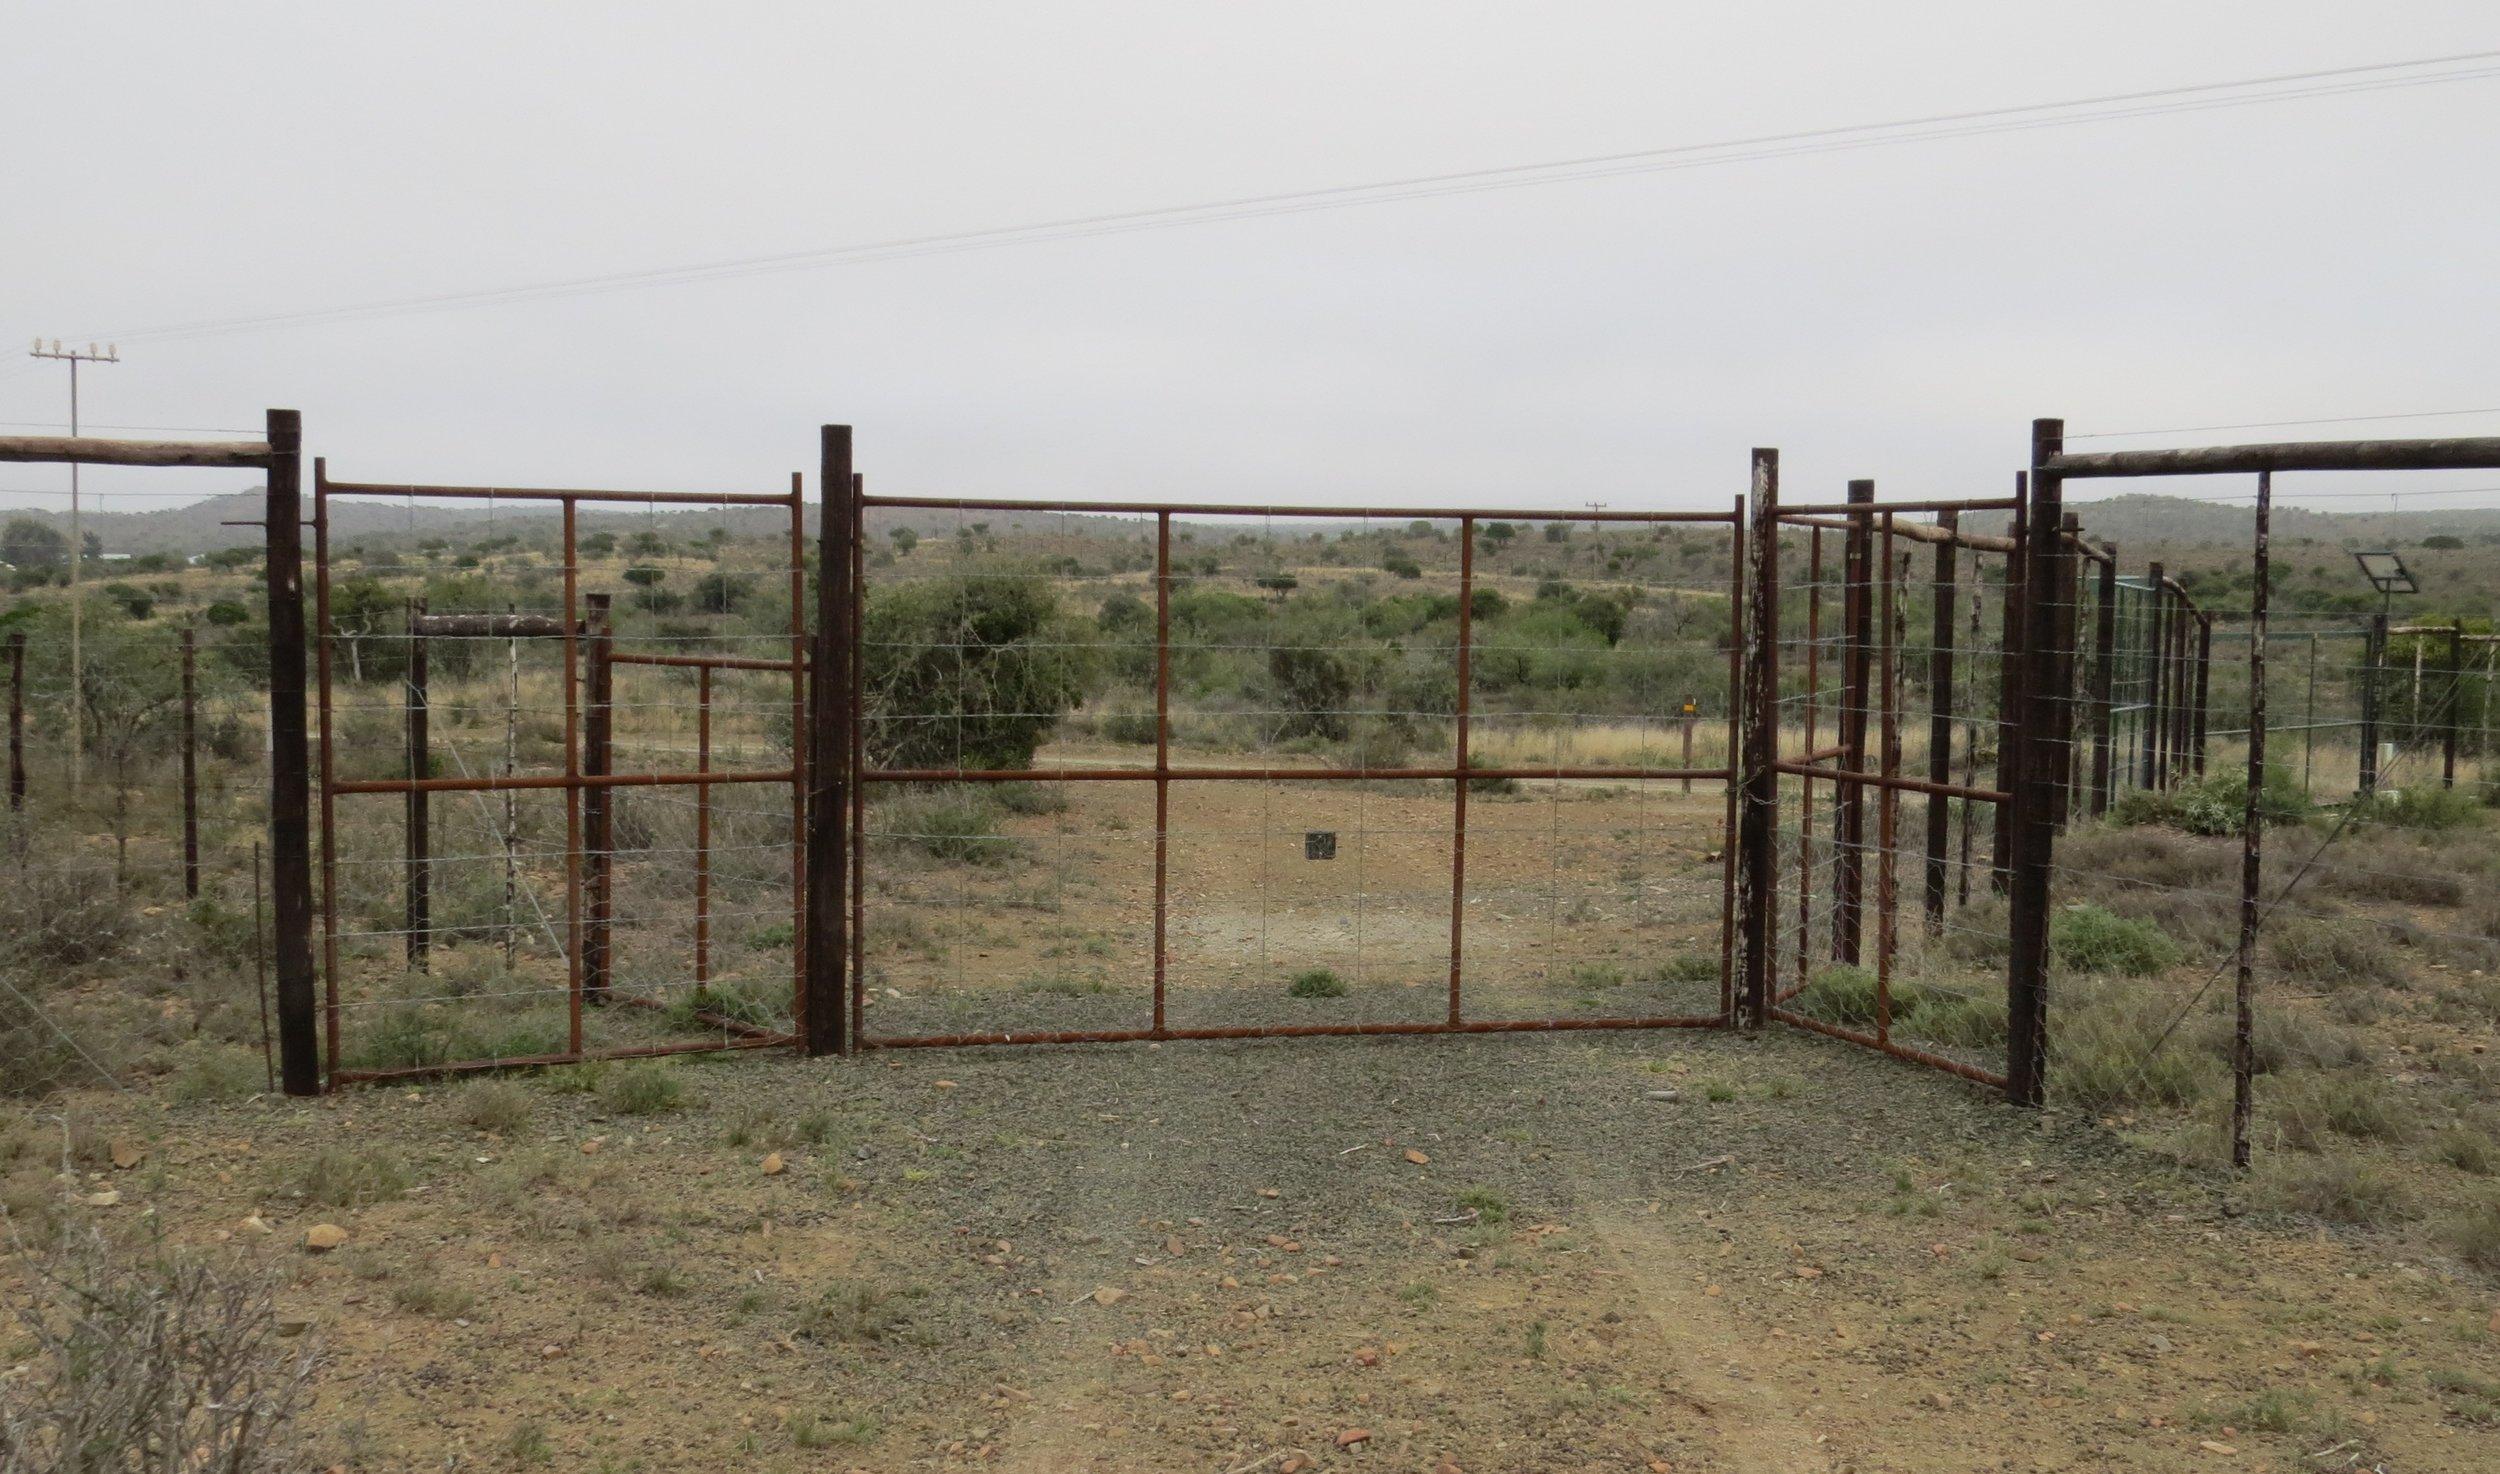 Gates in every corner